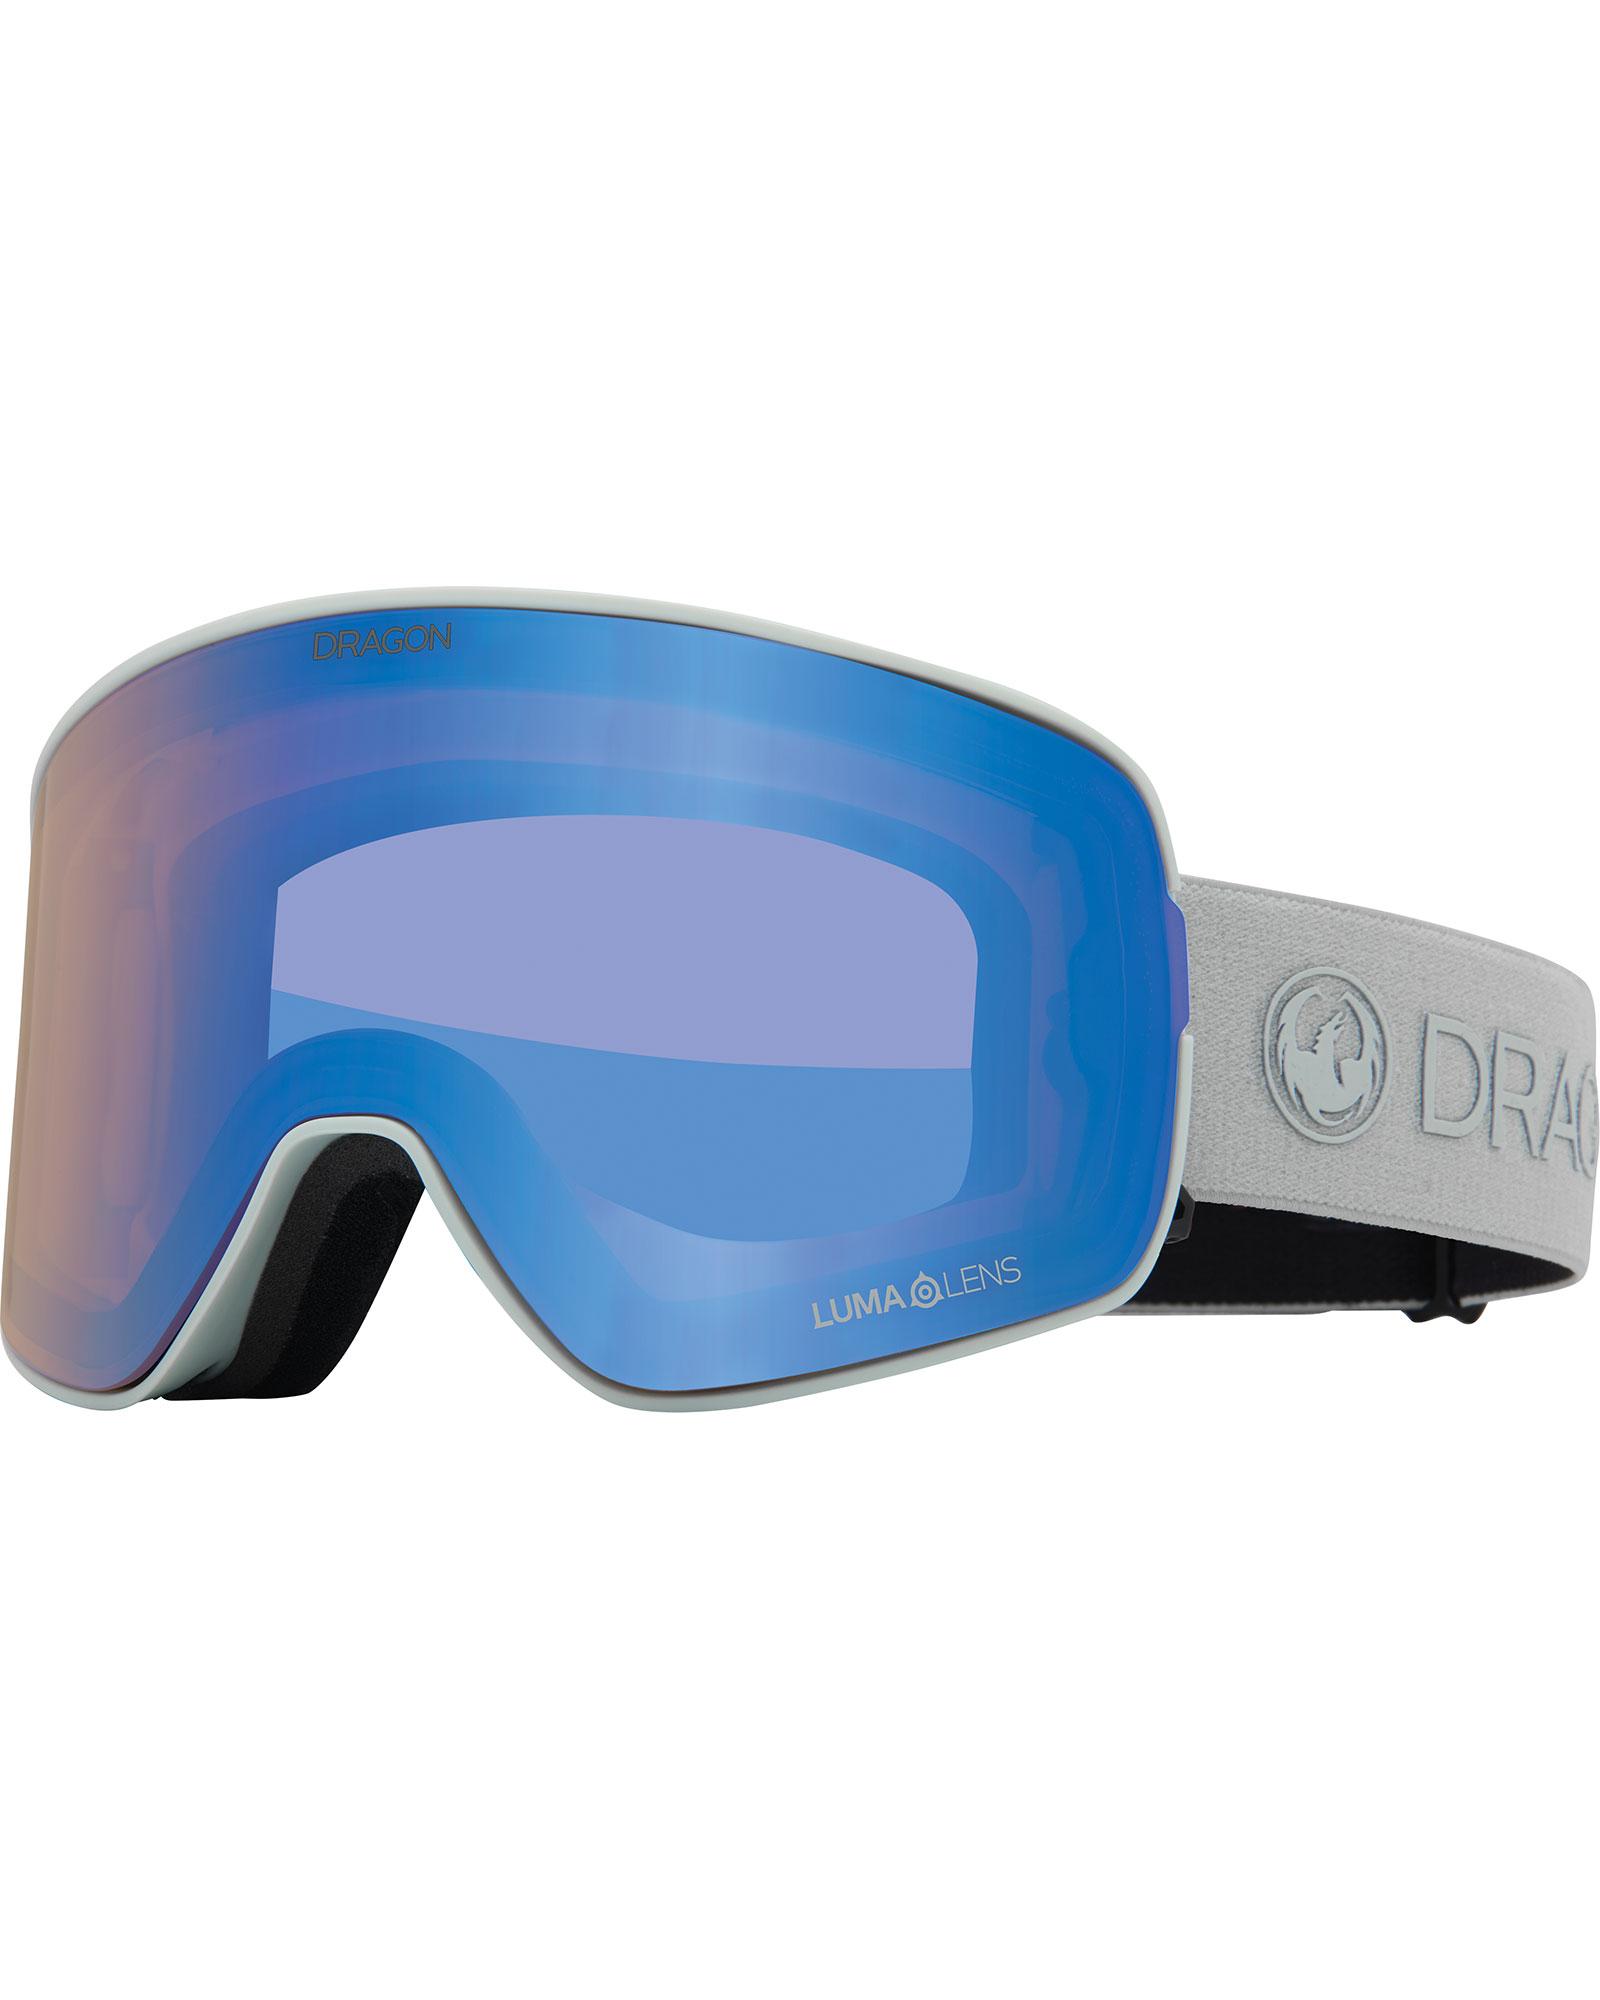 Dragon NFX2 Salt / Lumalens Flash Blue + Lumalens Dark Smoke Goggles 2020 / 2021 0